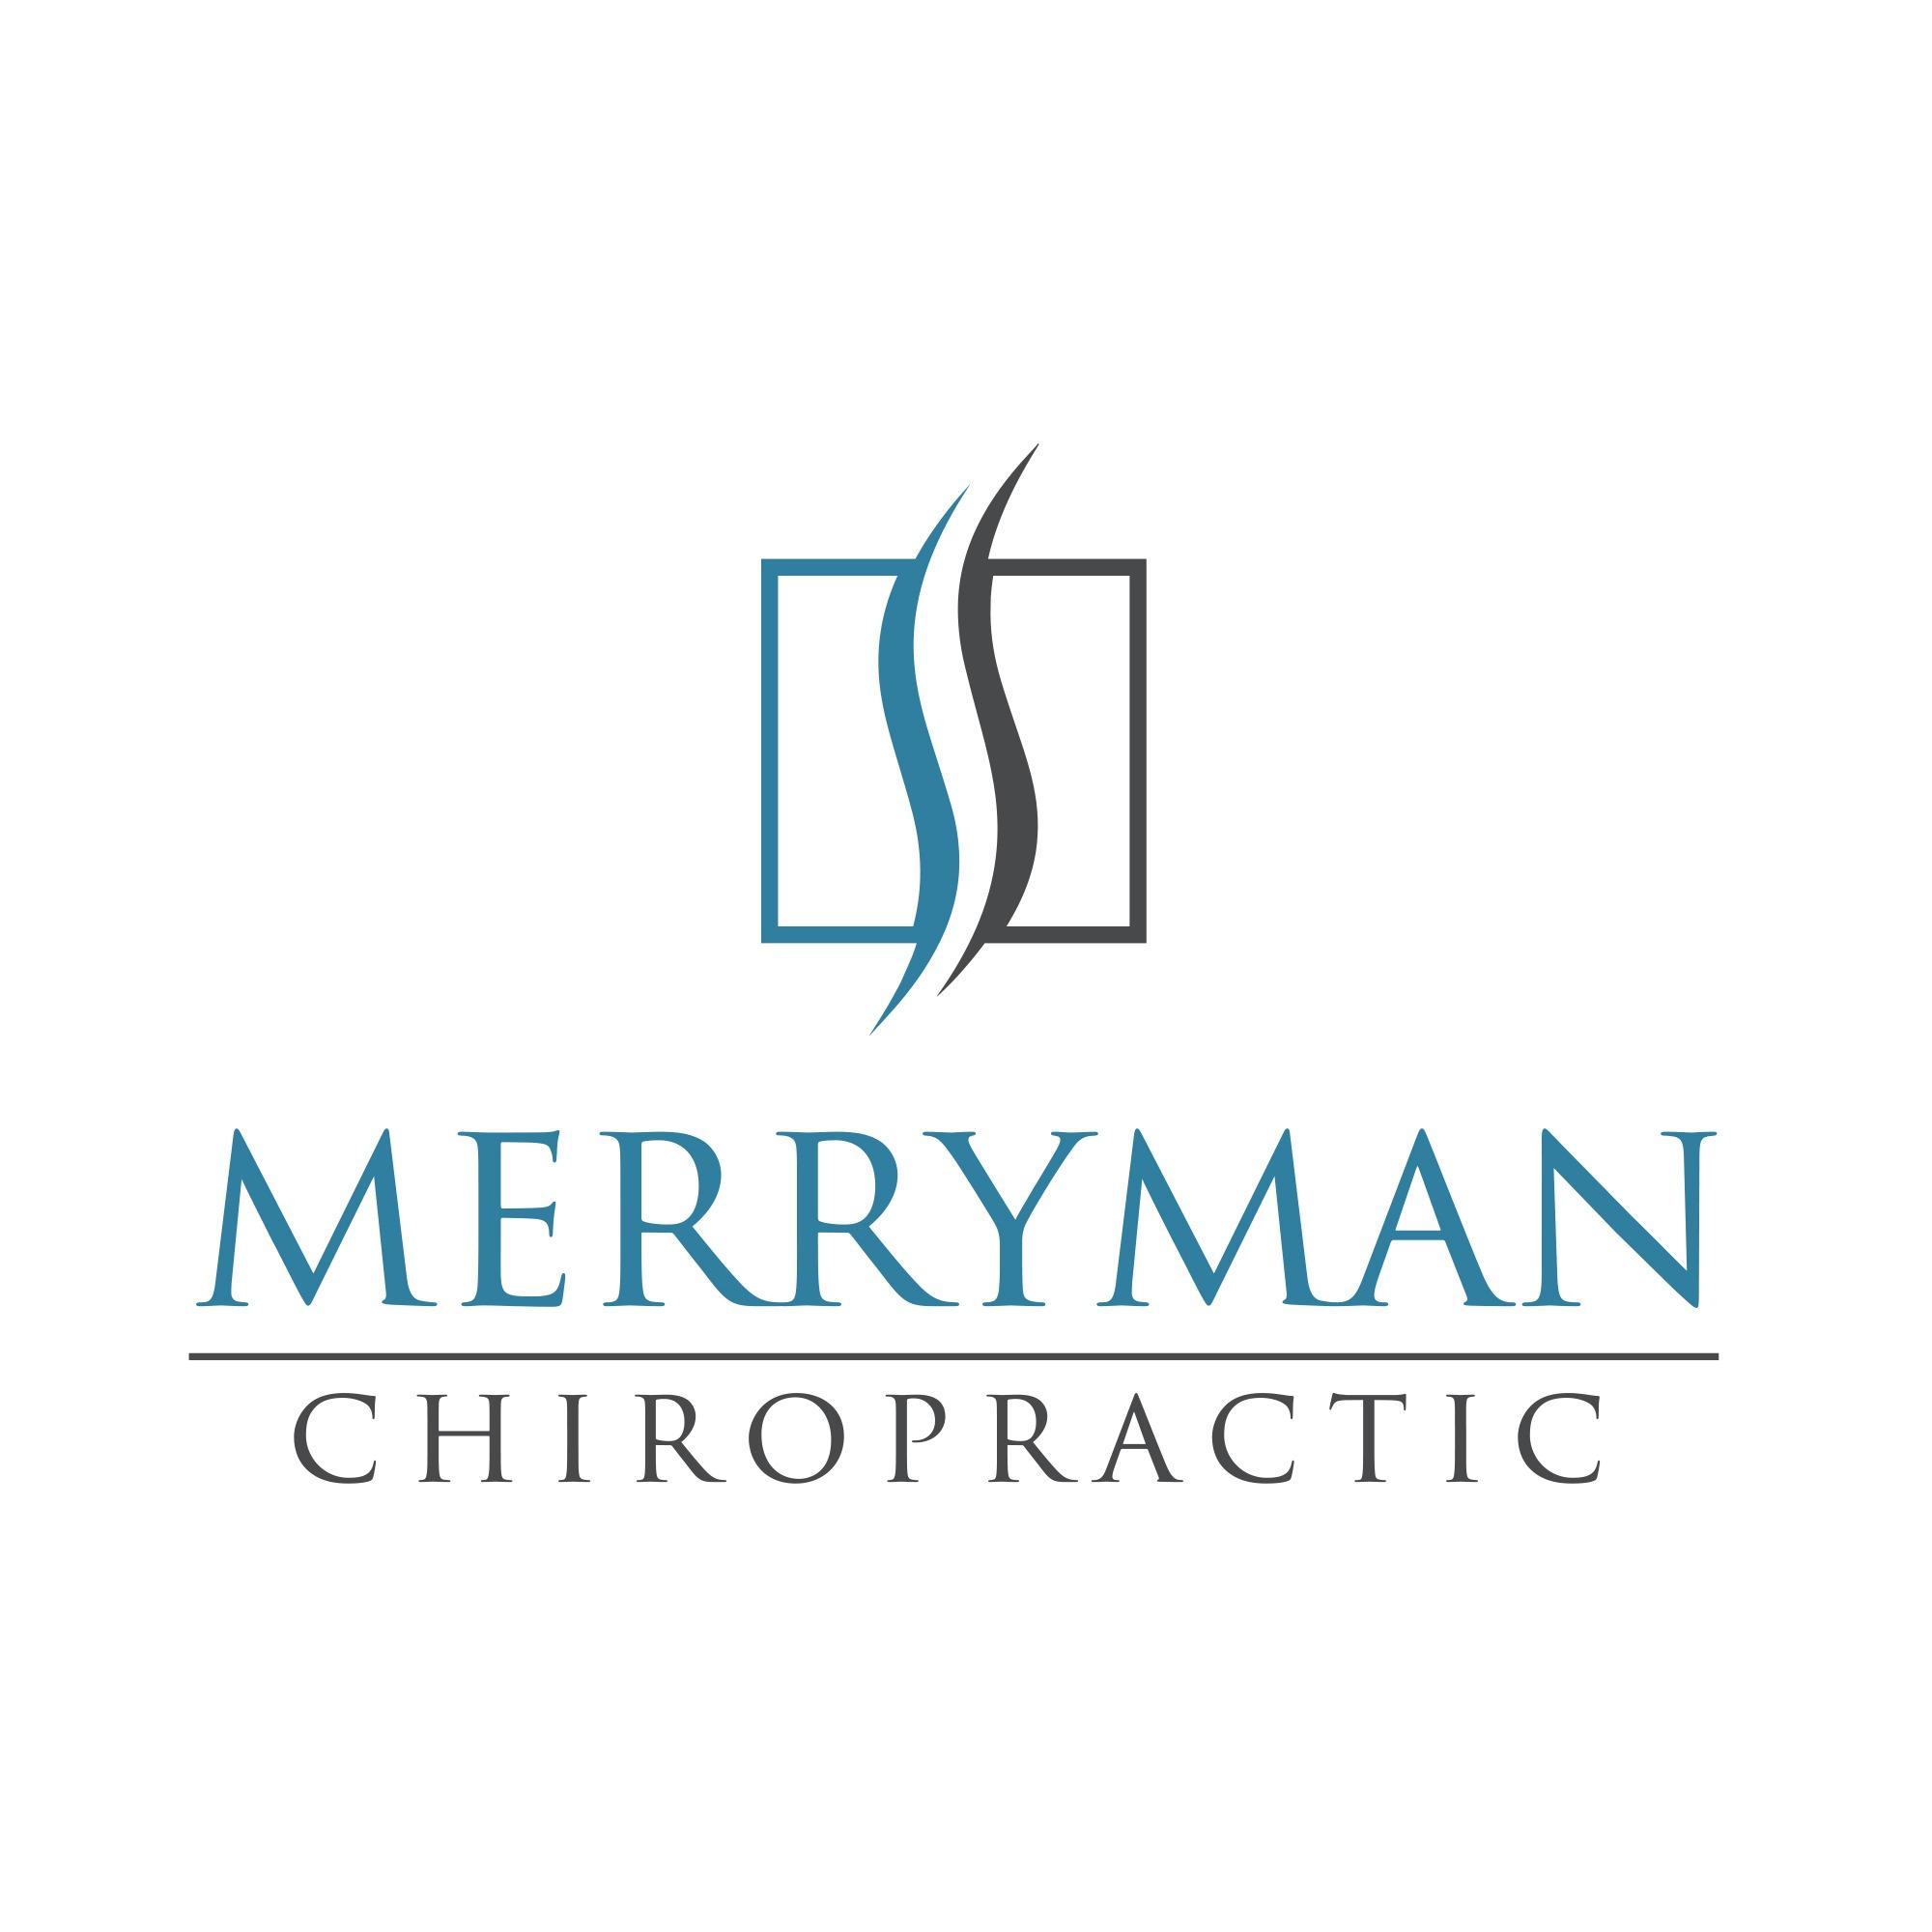 Merryman Chiropractic image 6